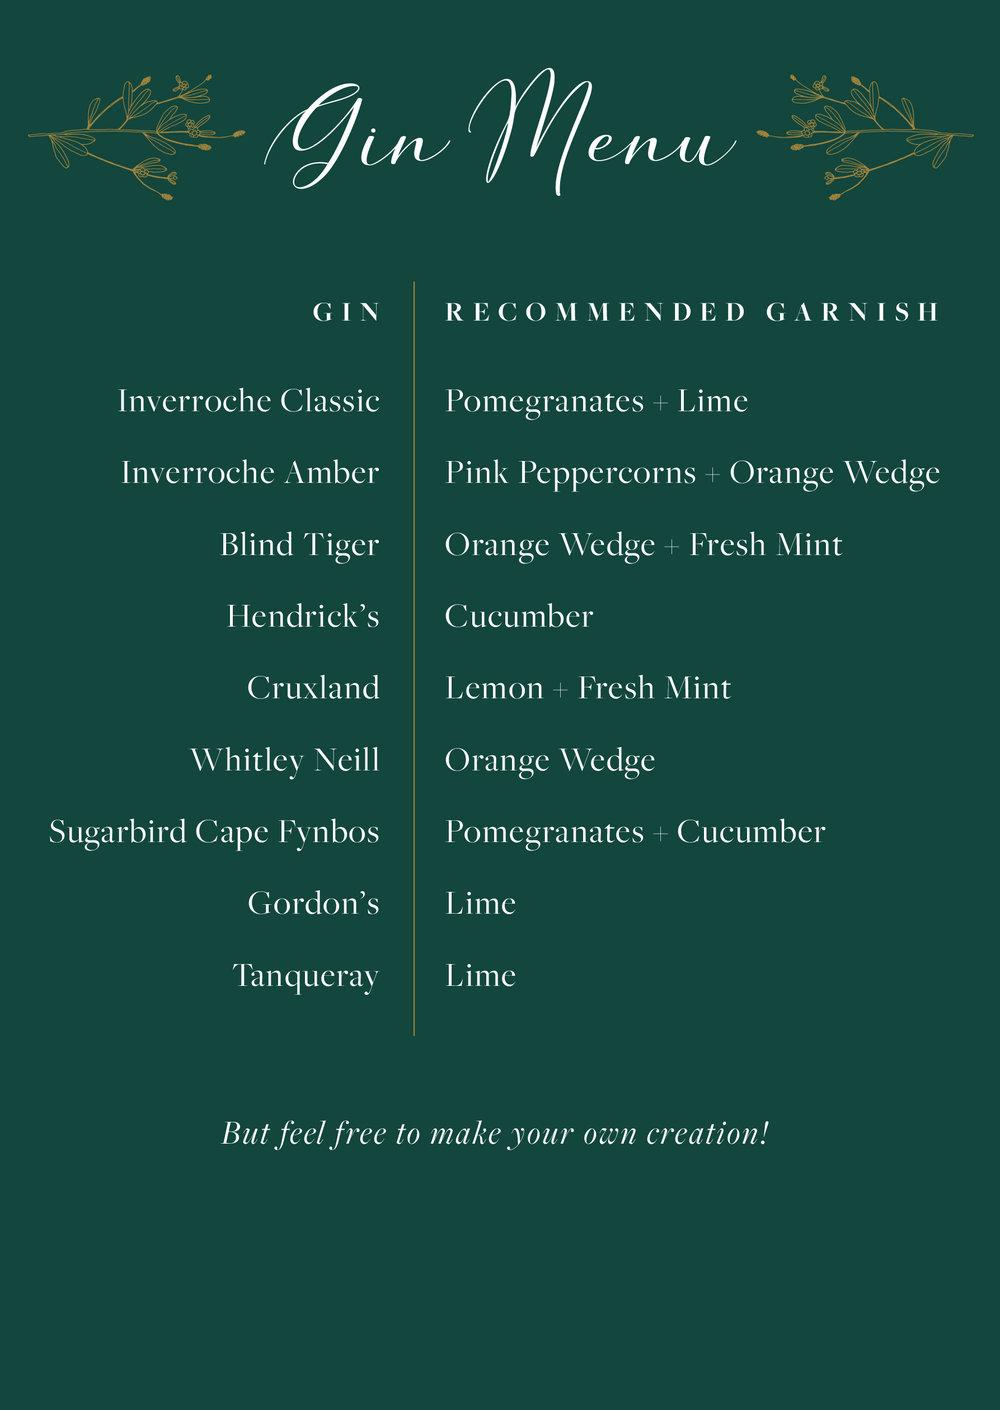 TJ_gin_menu.jpg